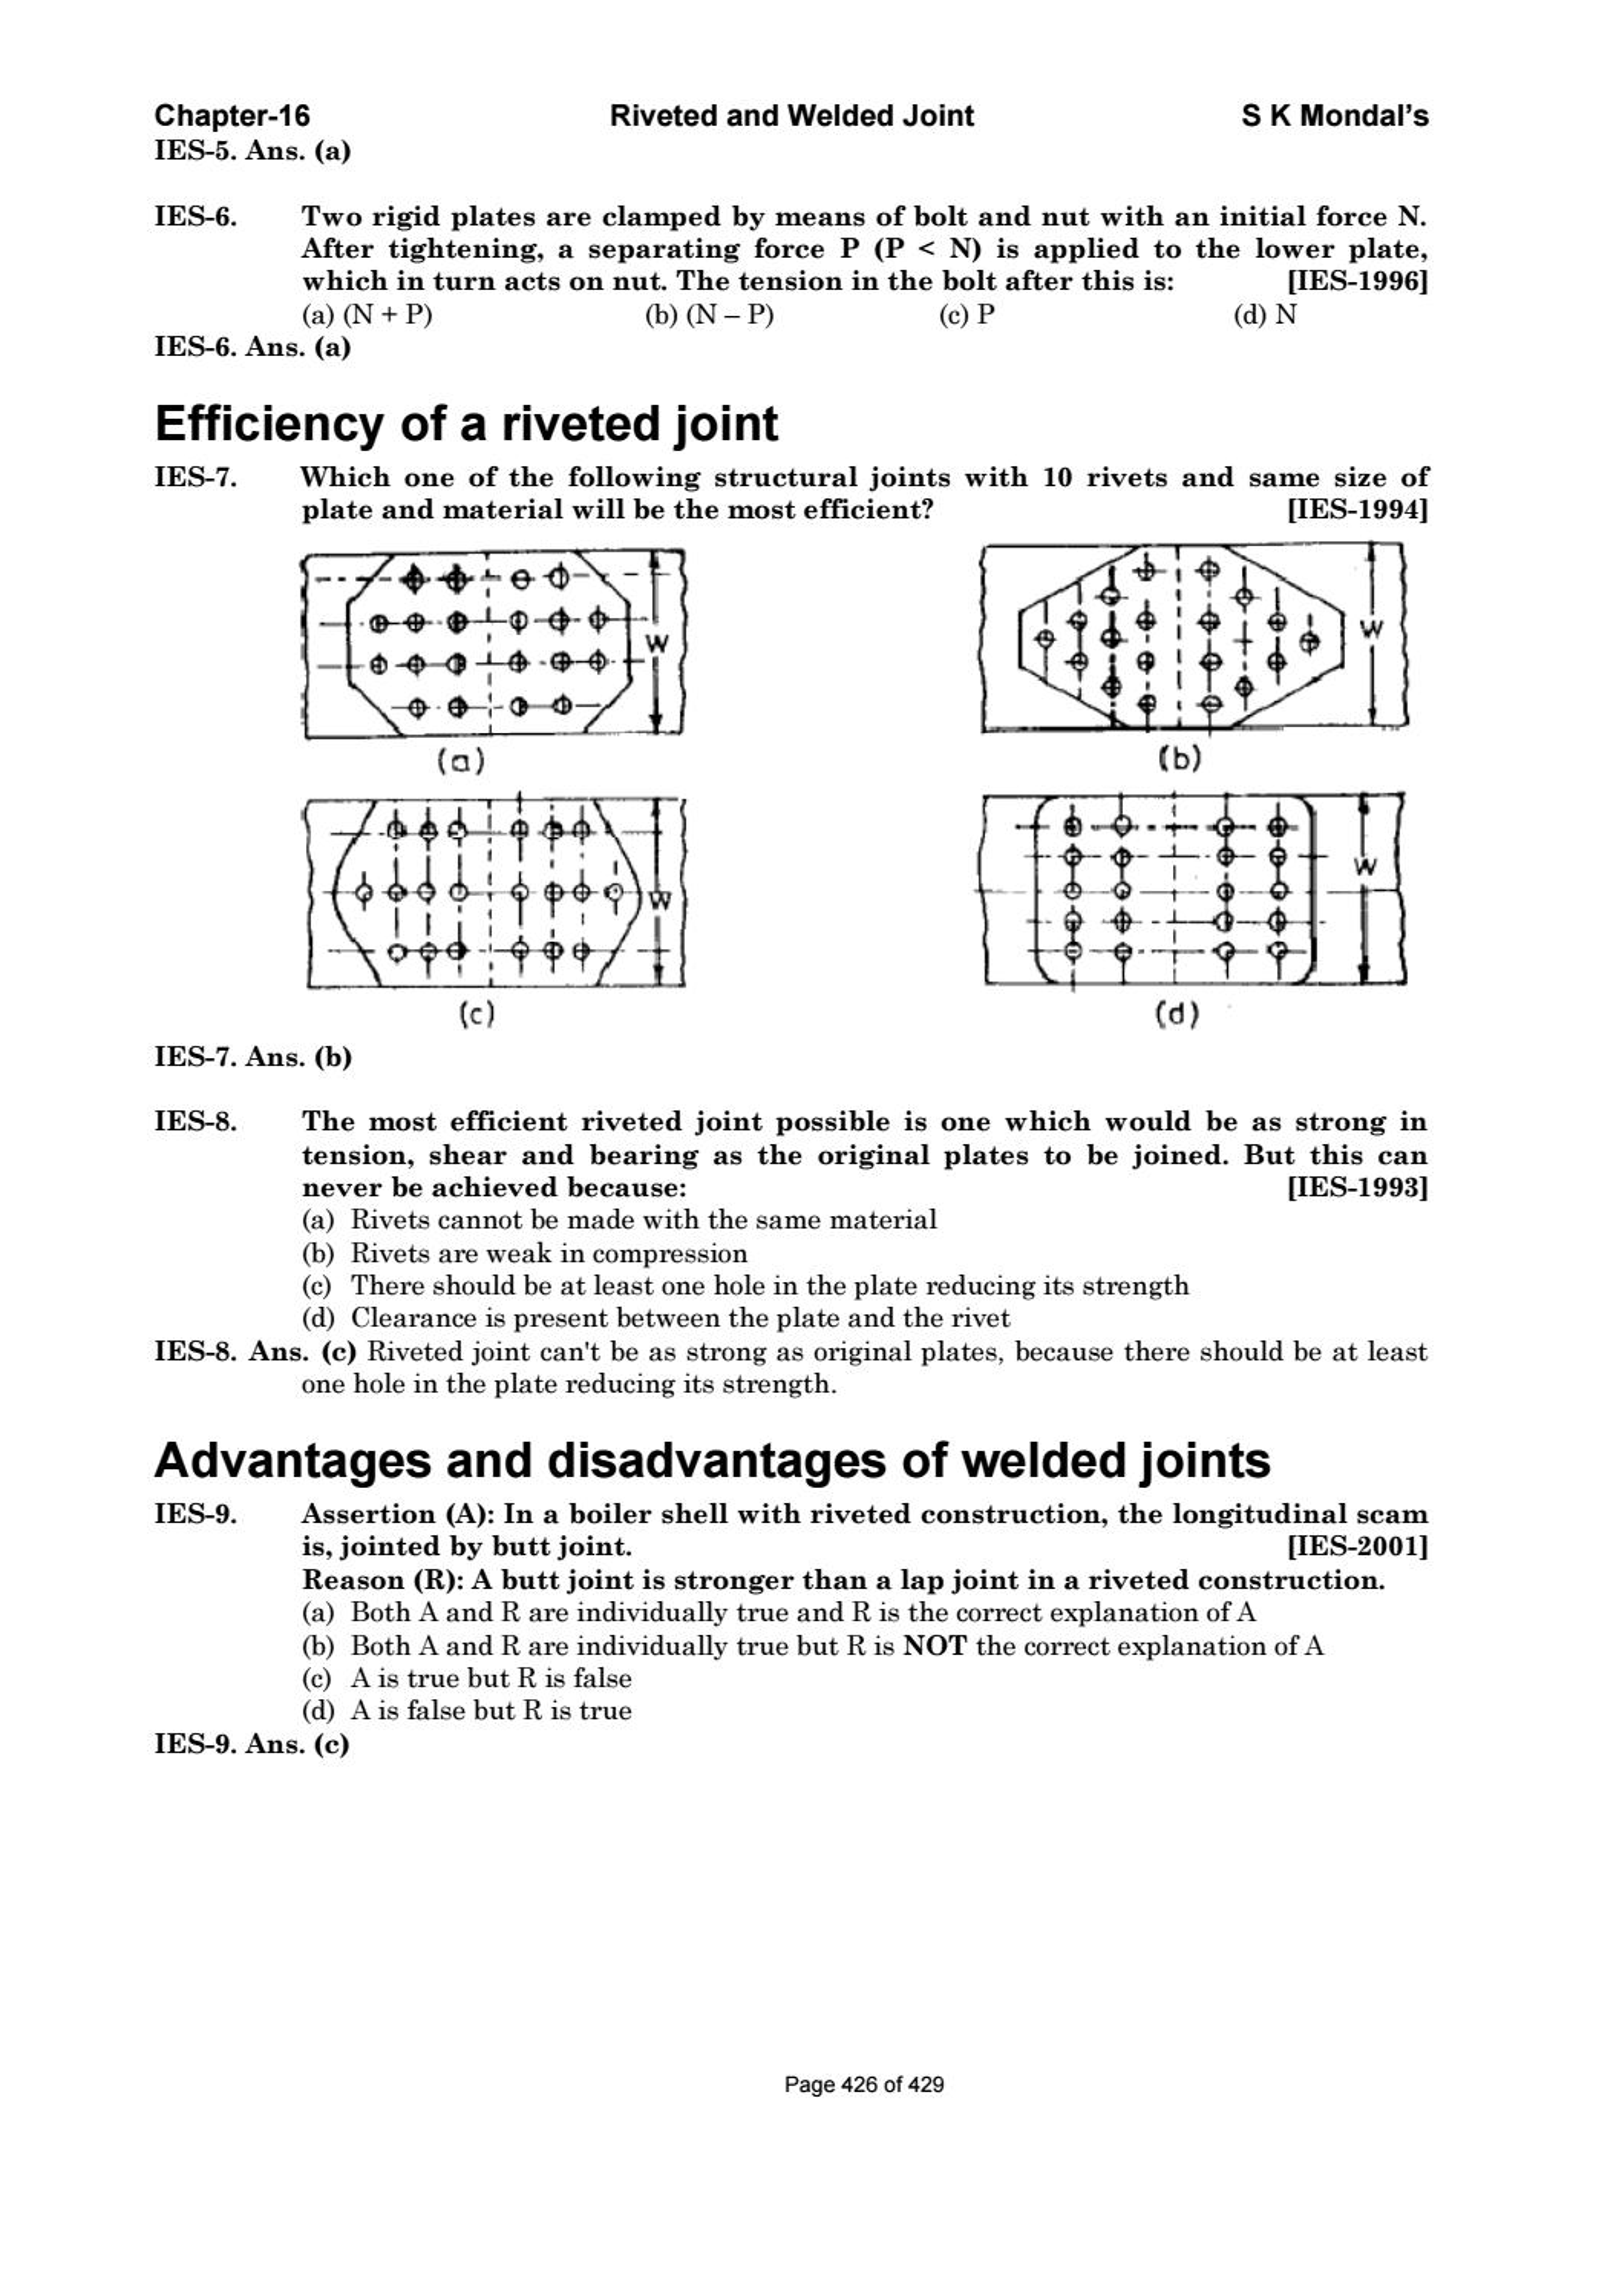 Riveting joints: advantages and disadvantages